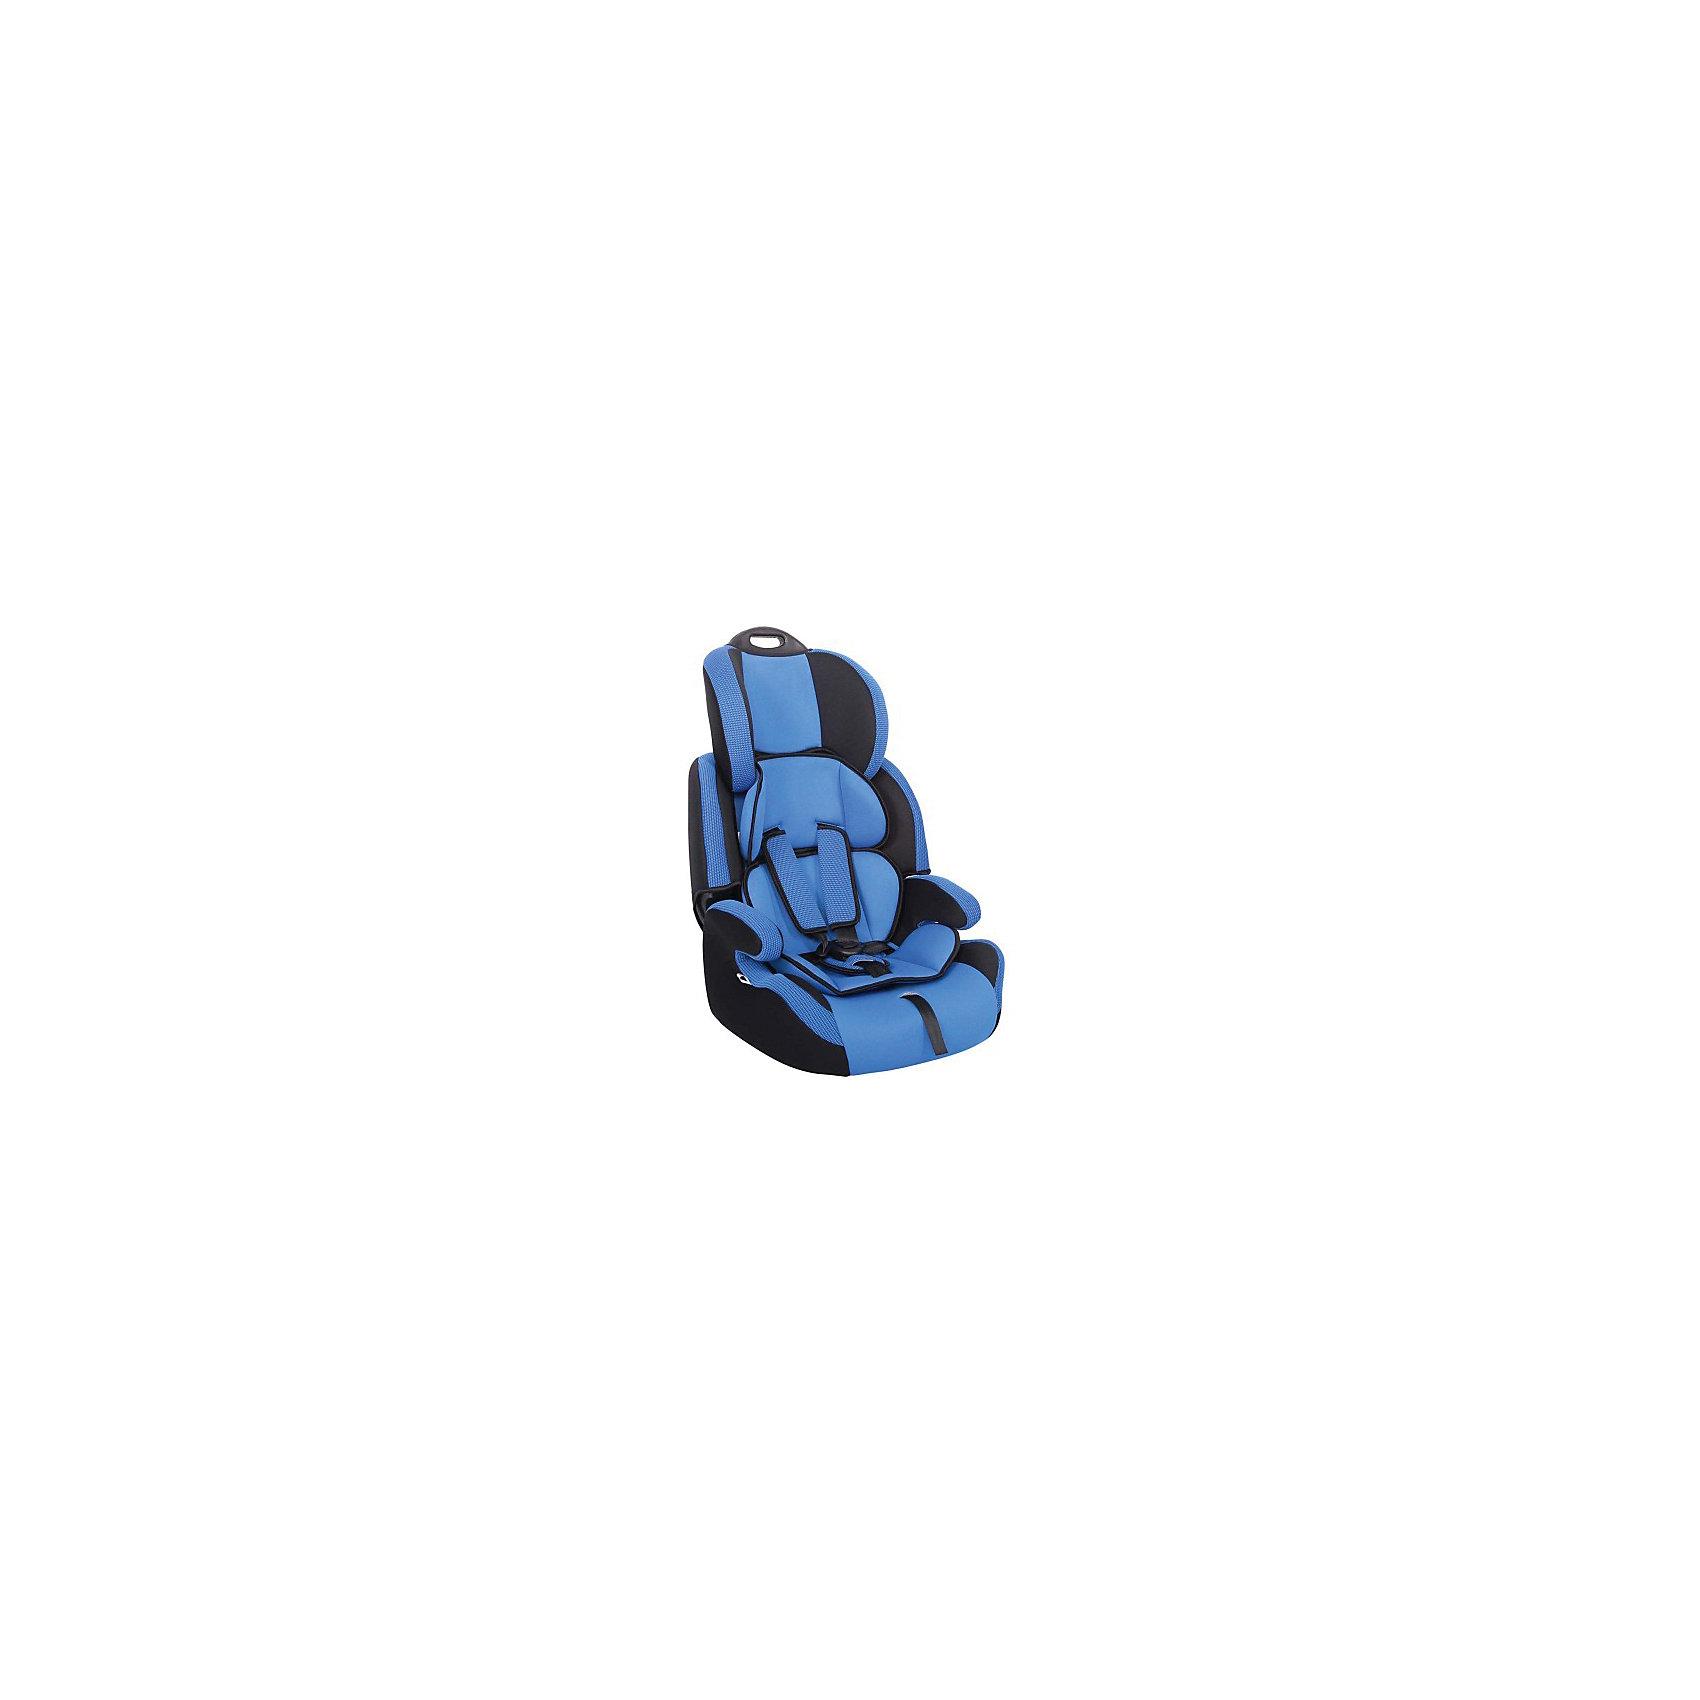 Siger Автокресло Стар, 9-36 кг., Siger, синий bs 523 подсвечник домик деда мороза pavone